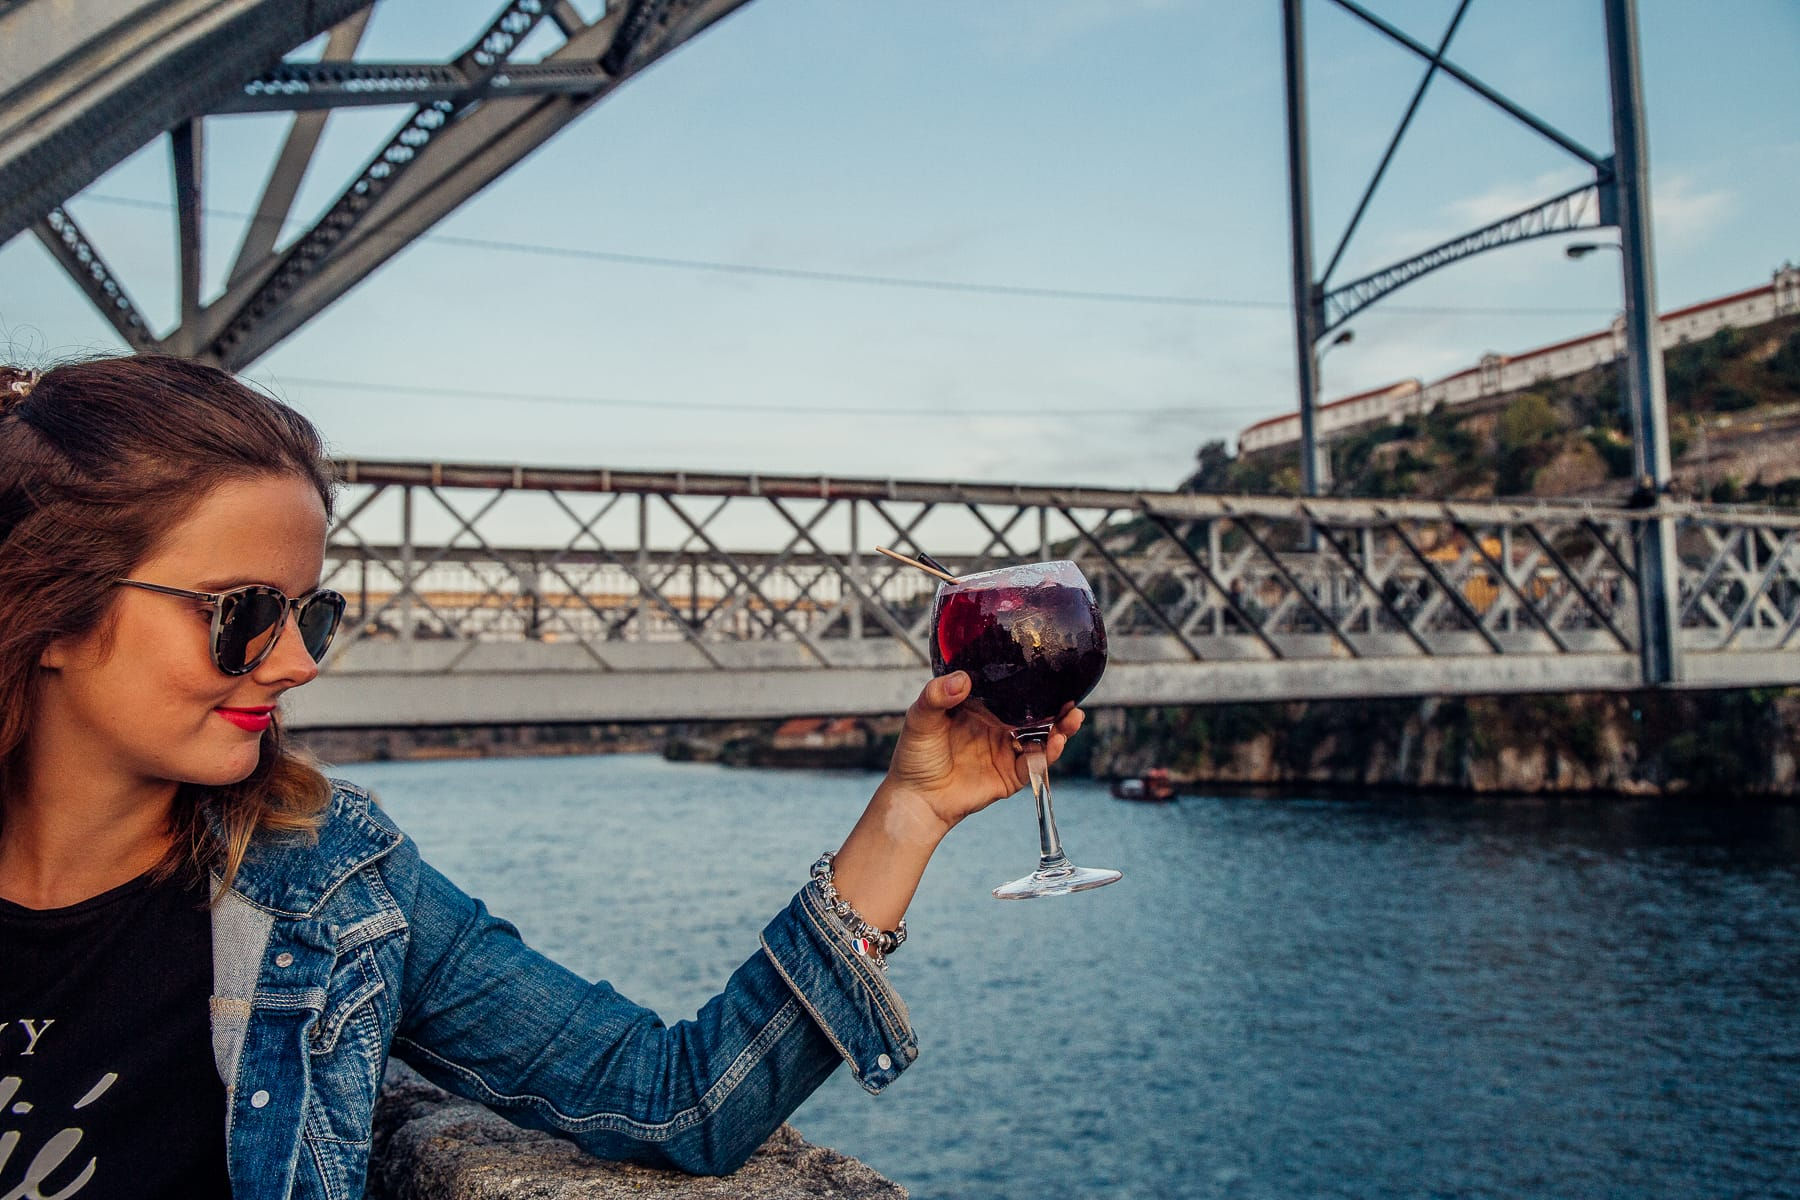 zehn-porto-tipps-fuer-deine-staedtereise-in-portugal-reiseblog-des-belles-choses 28